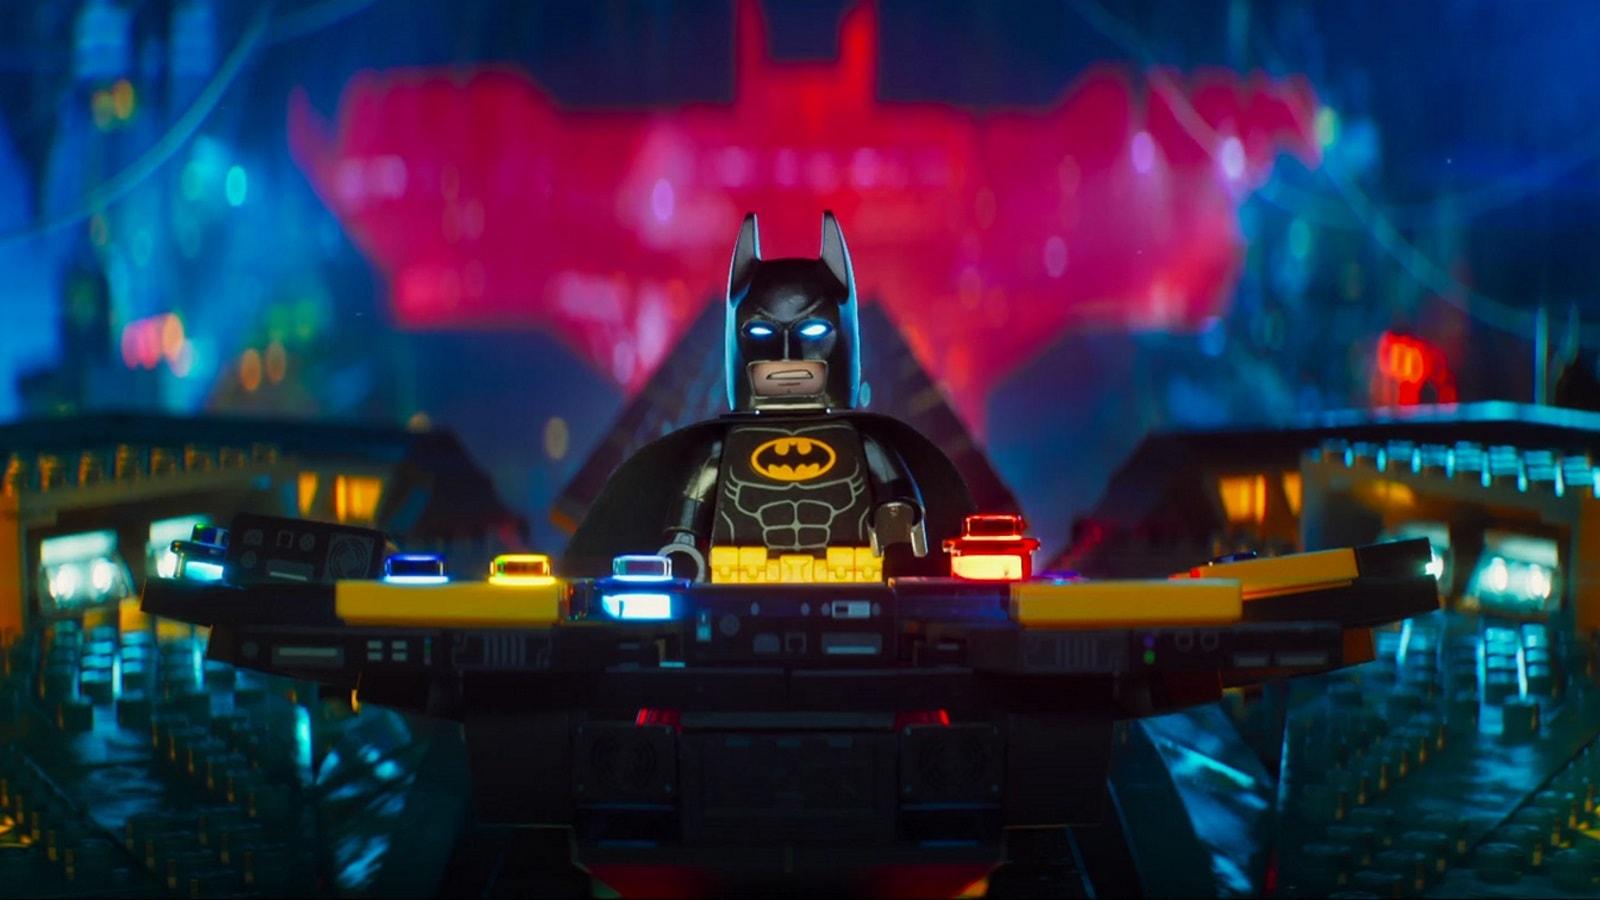 The Lego Batman Movie Hd Wallpapers 7wallpapersnet